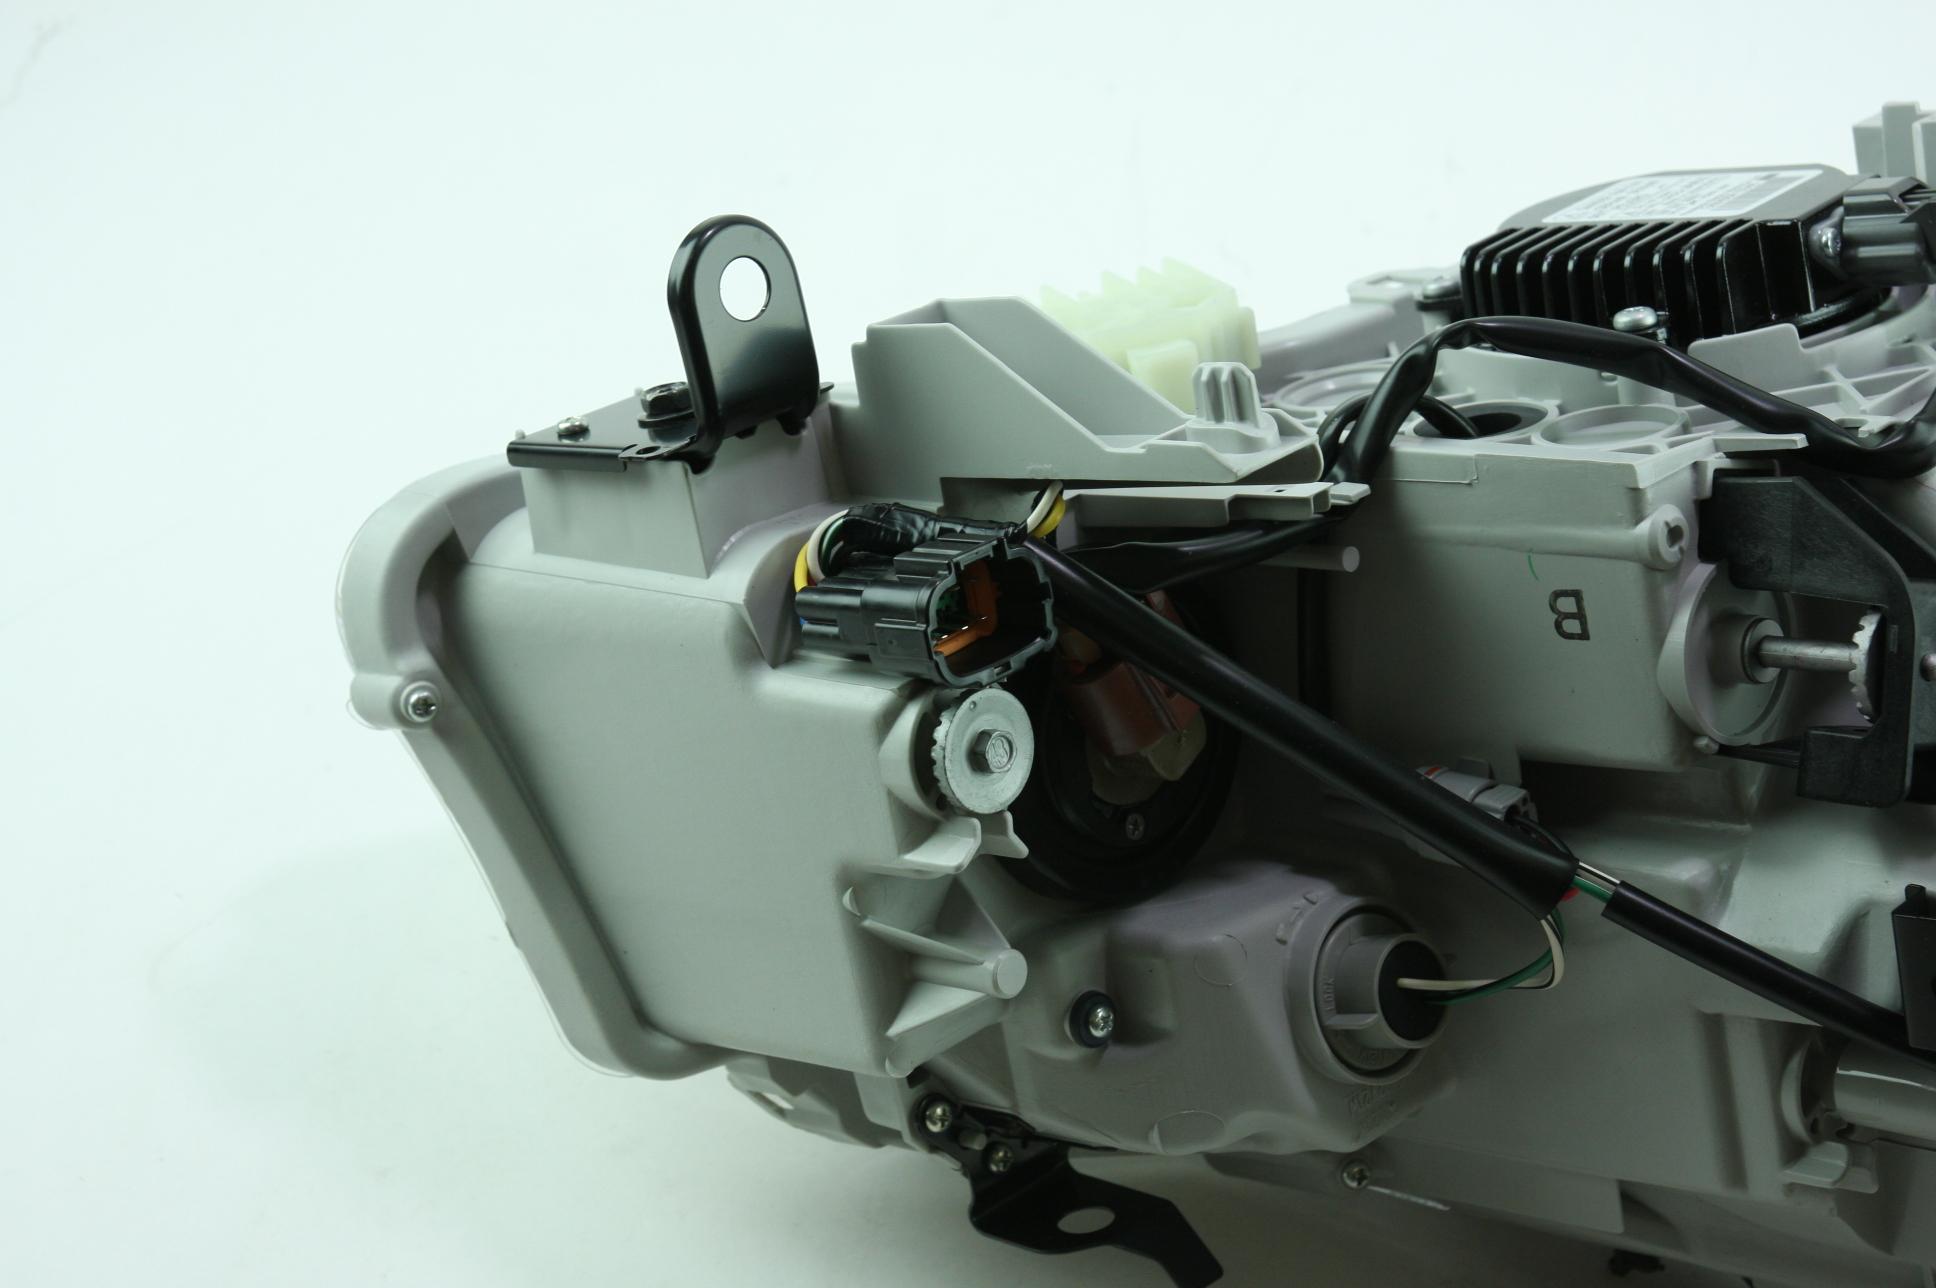 * Infiniti G37 Sedan Headlight LH Driver Side Genuine Nissan OEM 26060JK60E New - image 8